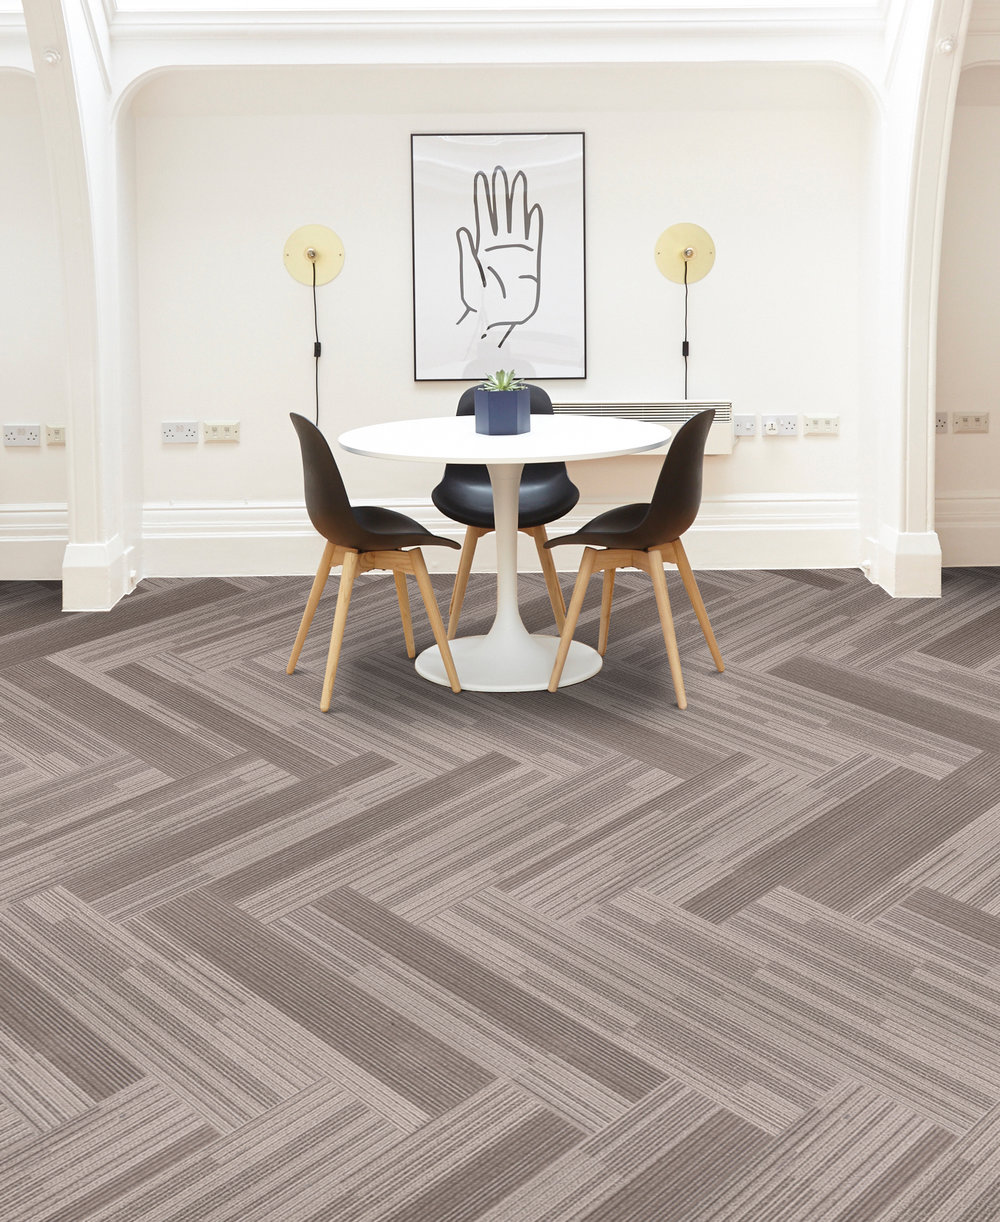 install carpet tiles wood floor